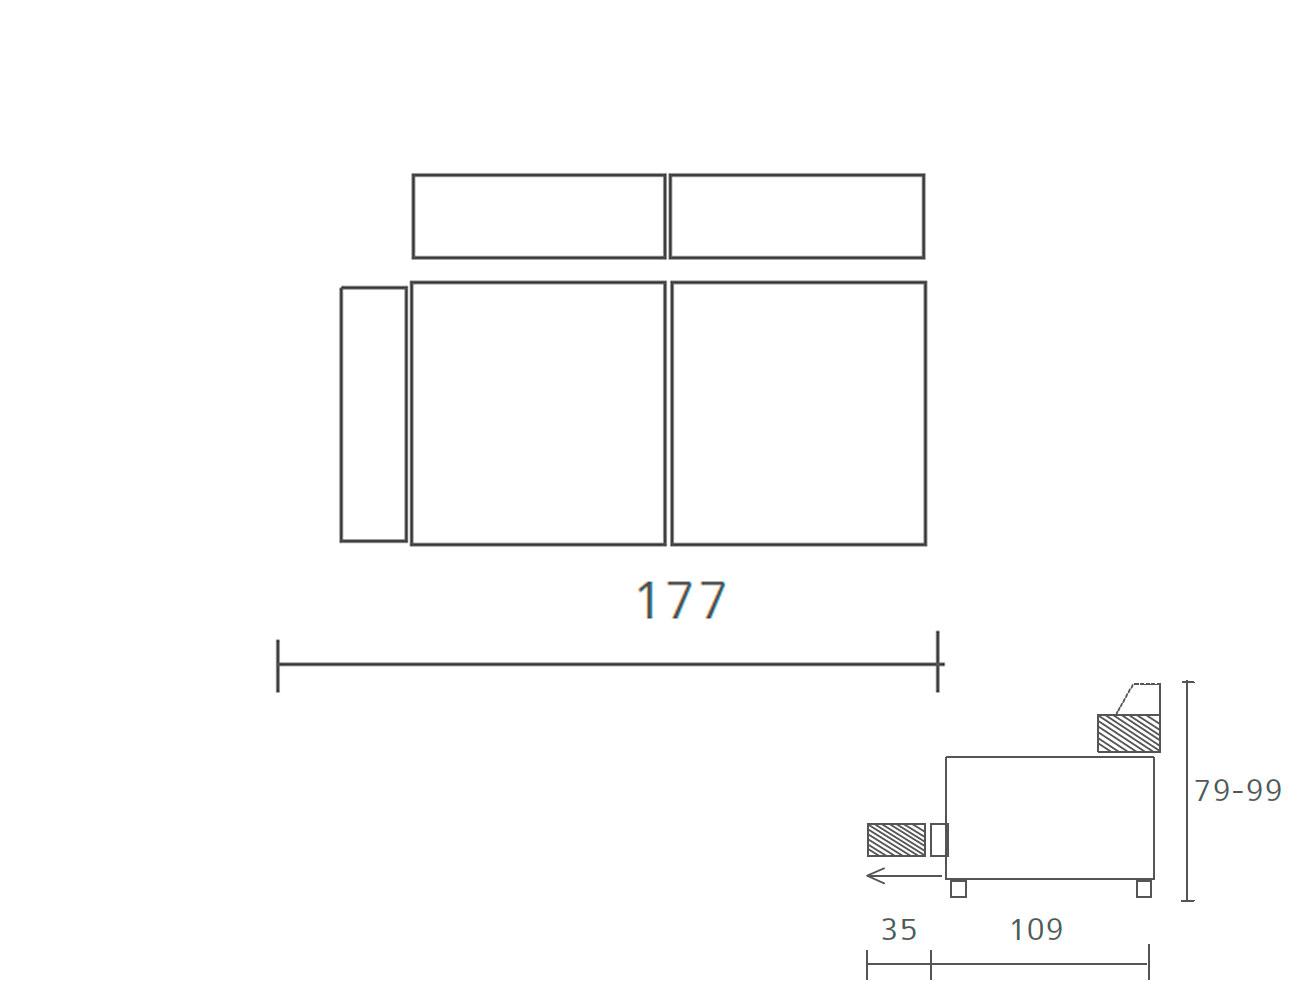 Sofa piel 2 plazas 1773